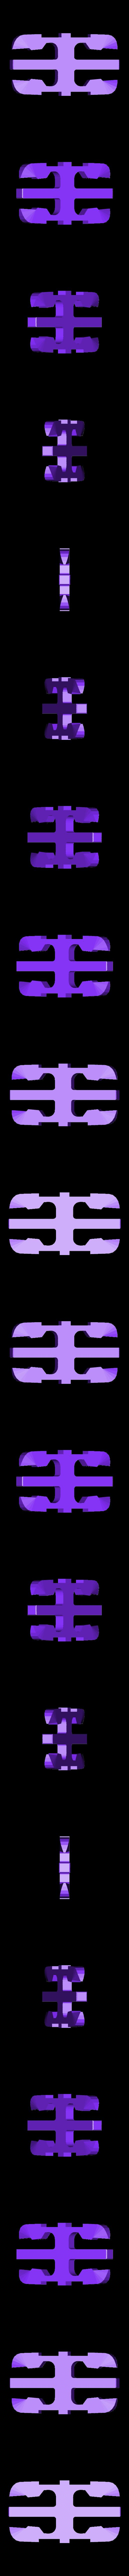 DJIstrap_male-male.stl Download free STL file DJI Mavic Ipad bracket with Combo strap snaps • 3D printing template, MatsErik